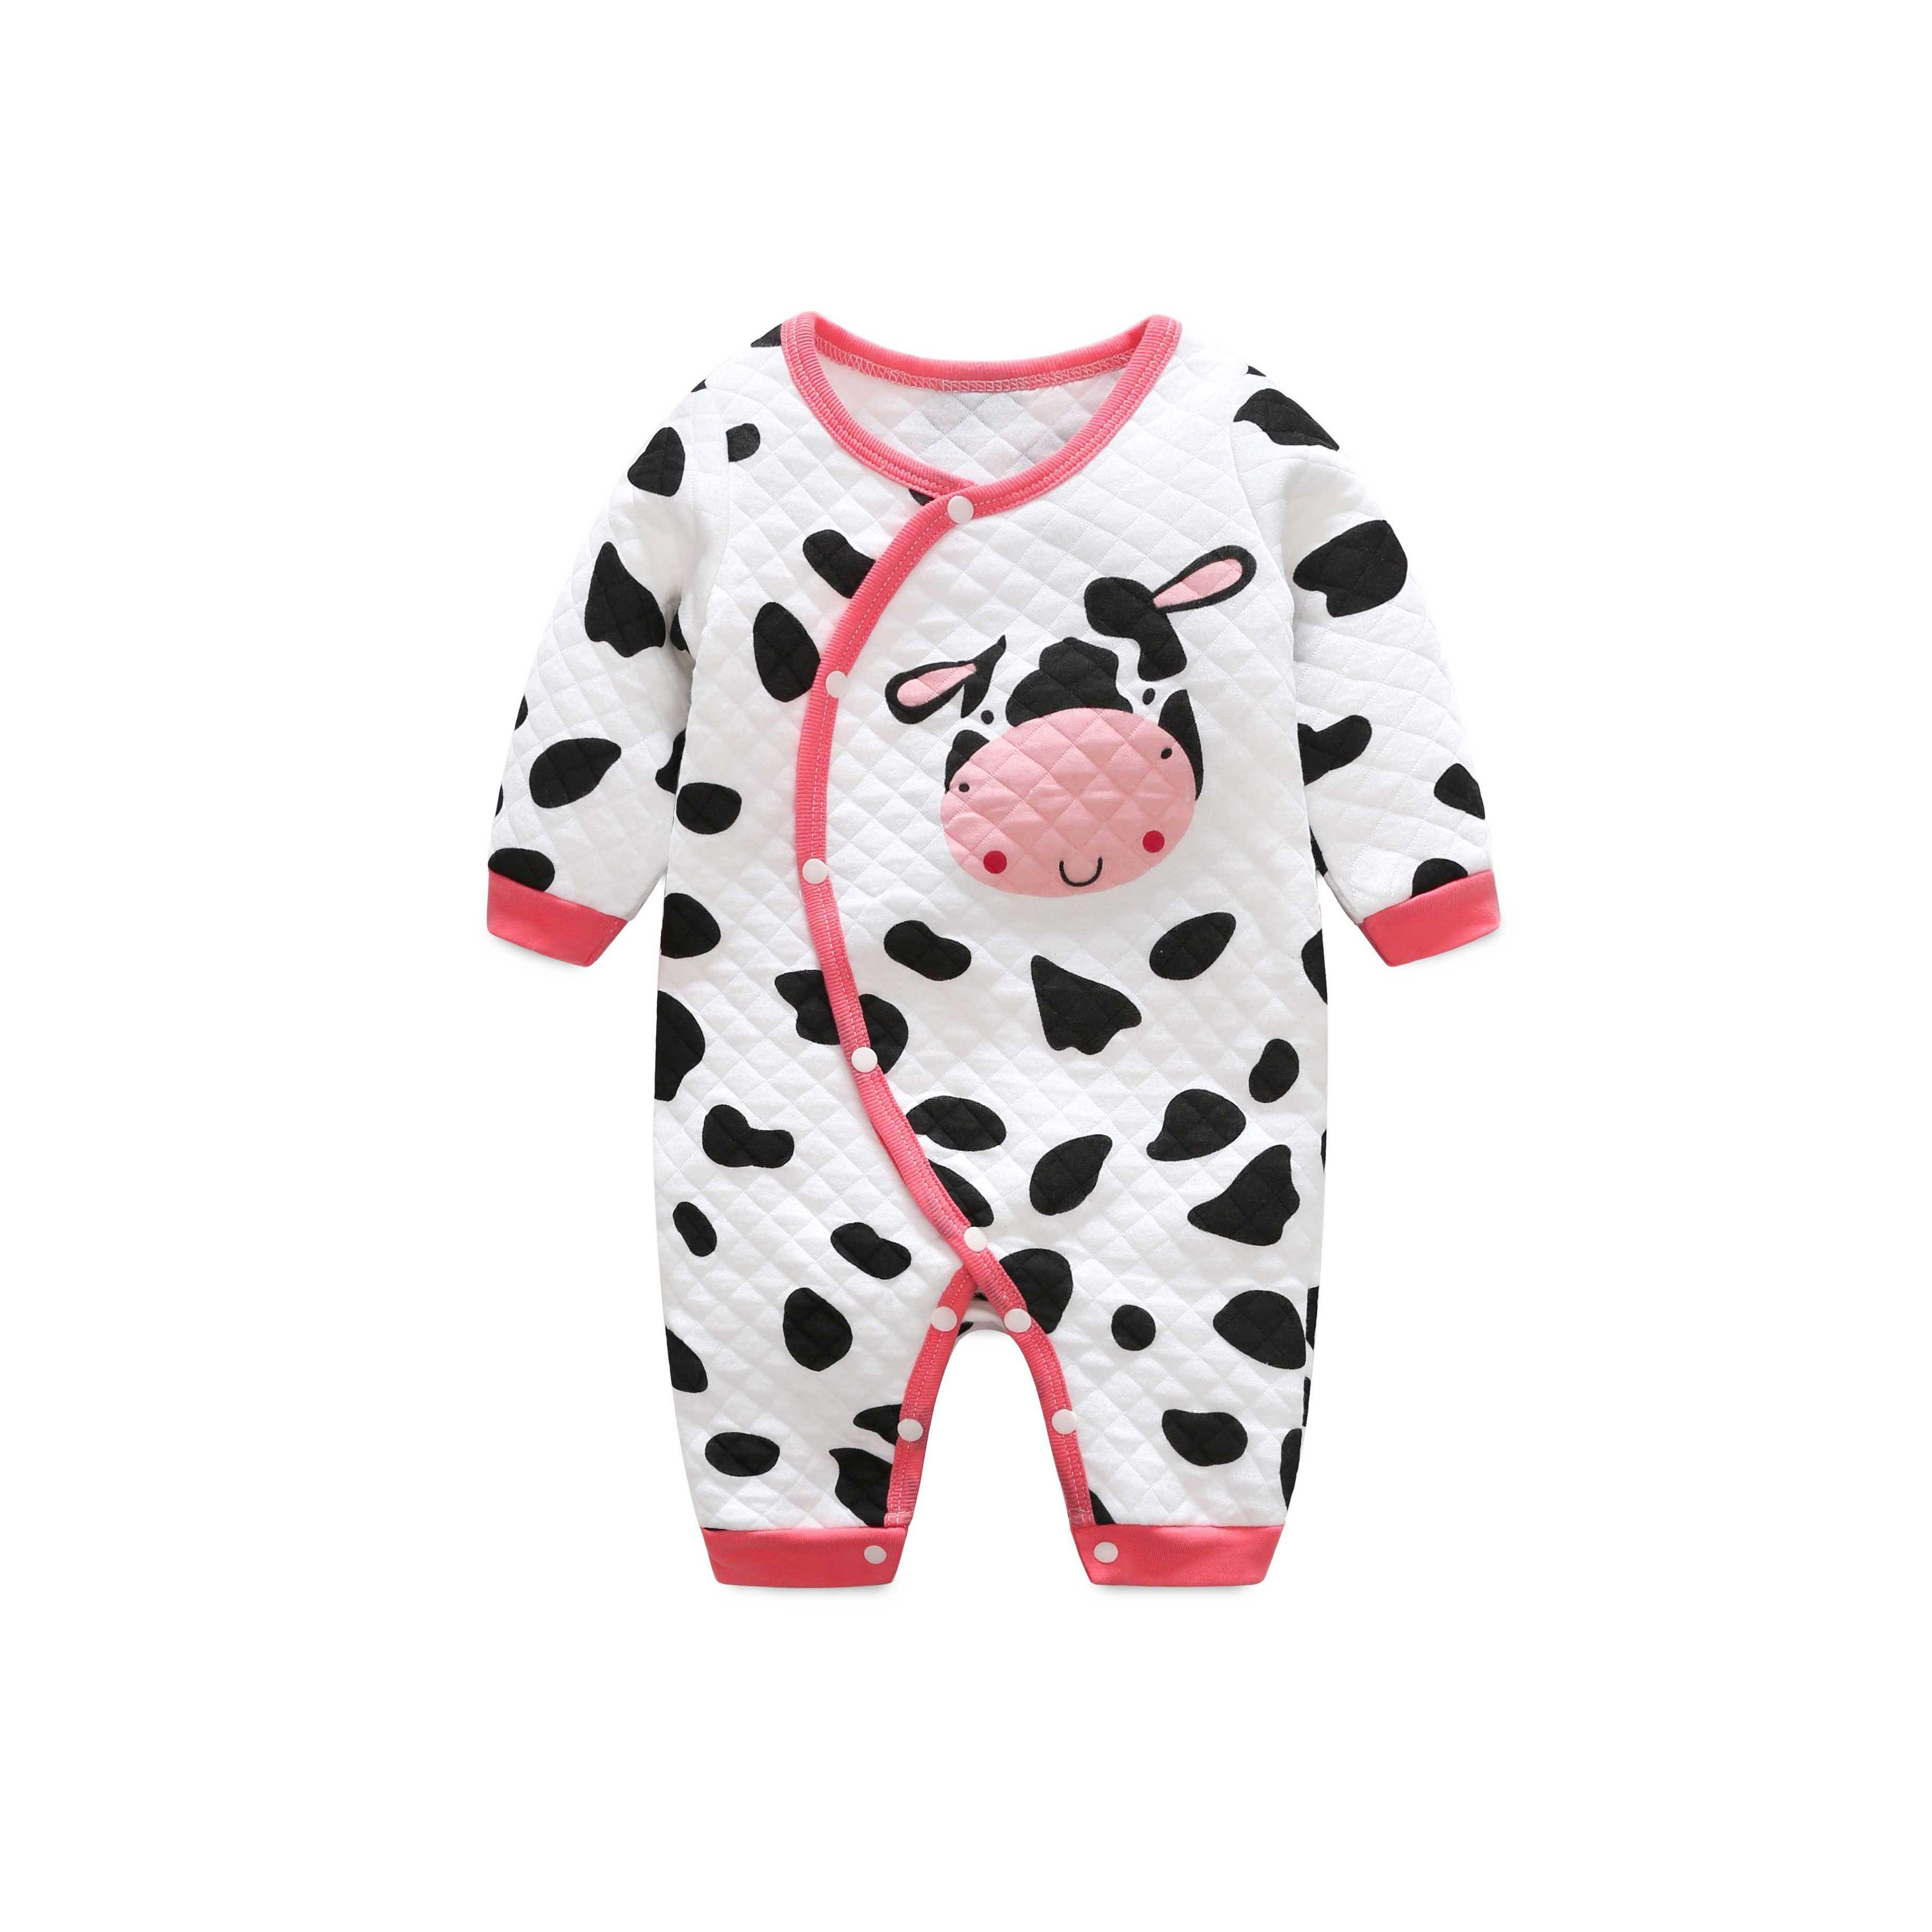 Online Cheap Colorful Cotton Baby Pajamas Cartoon Boys Girls Night